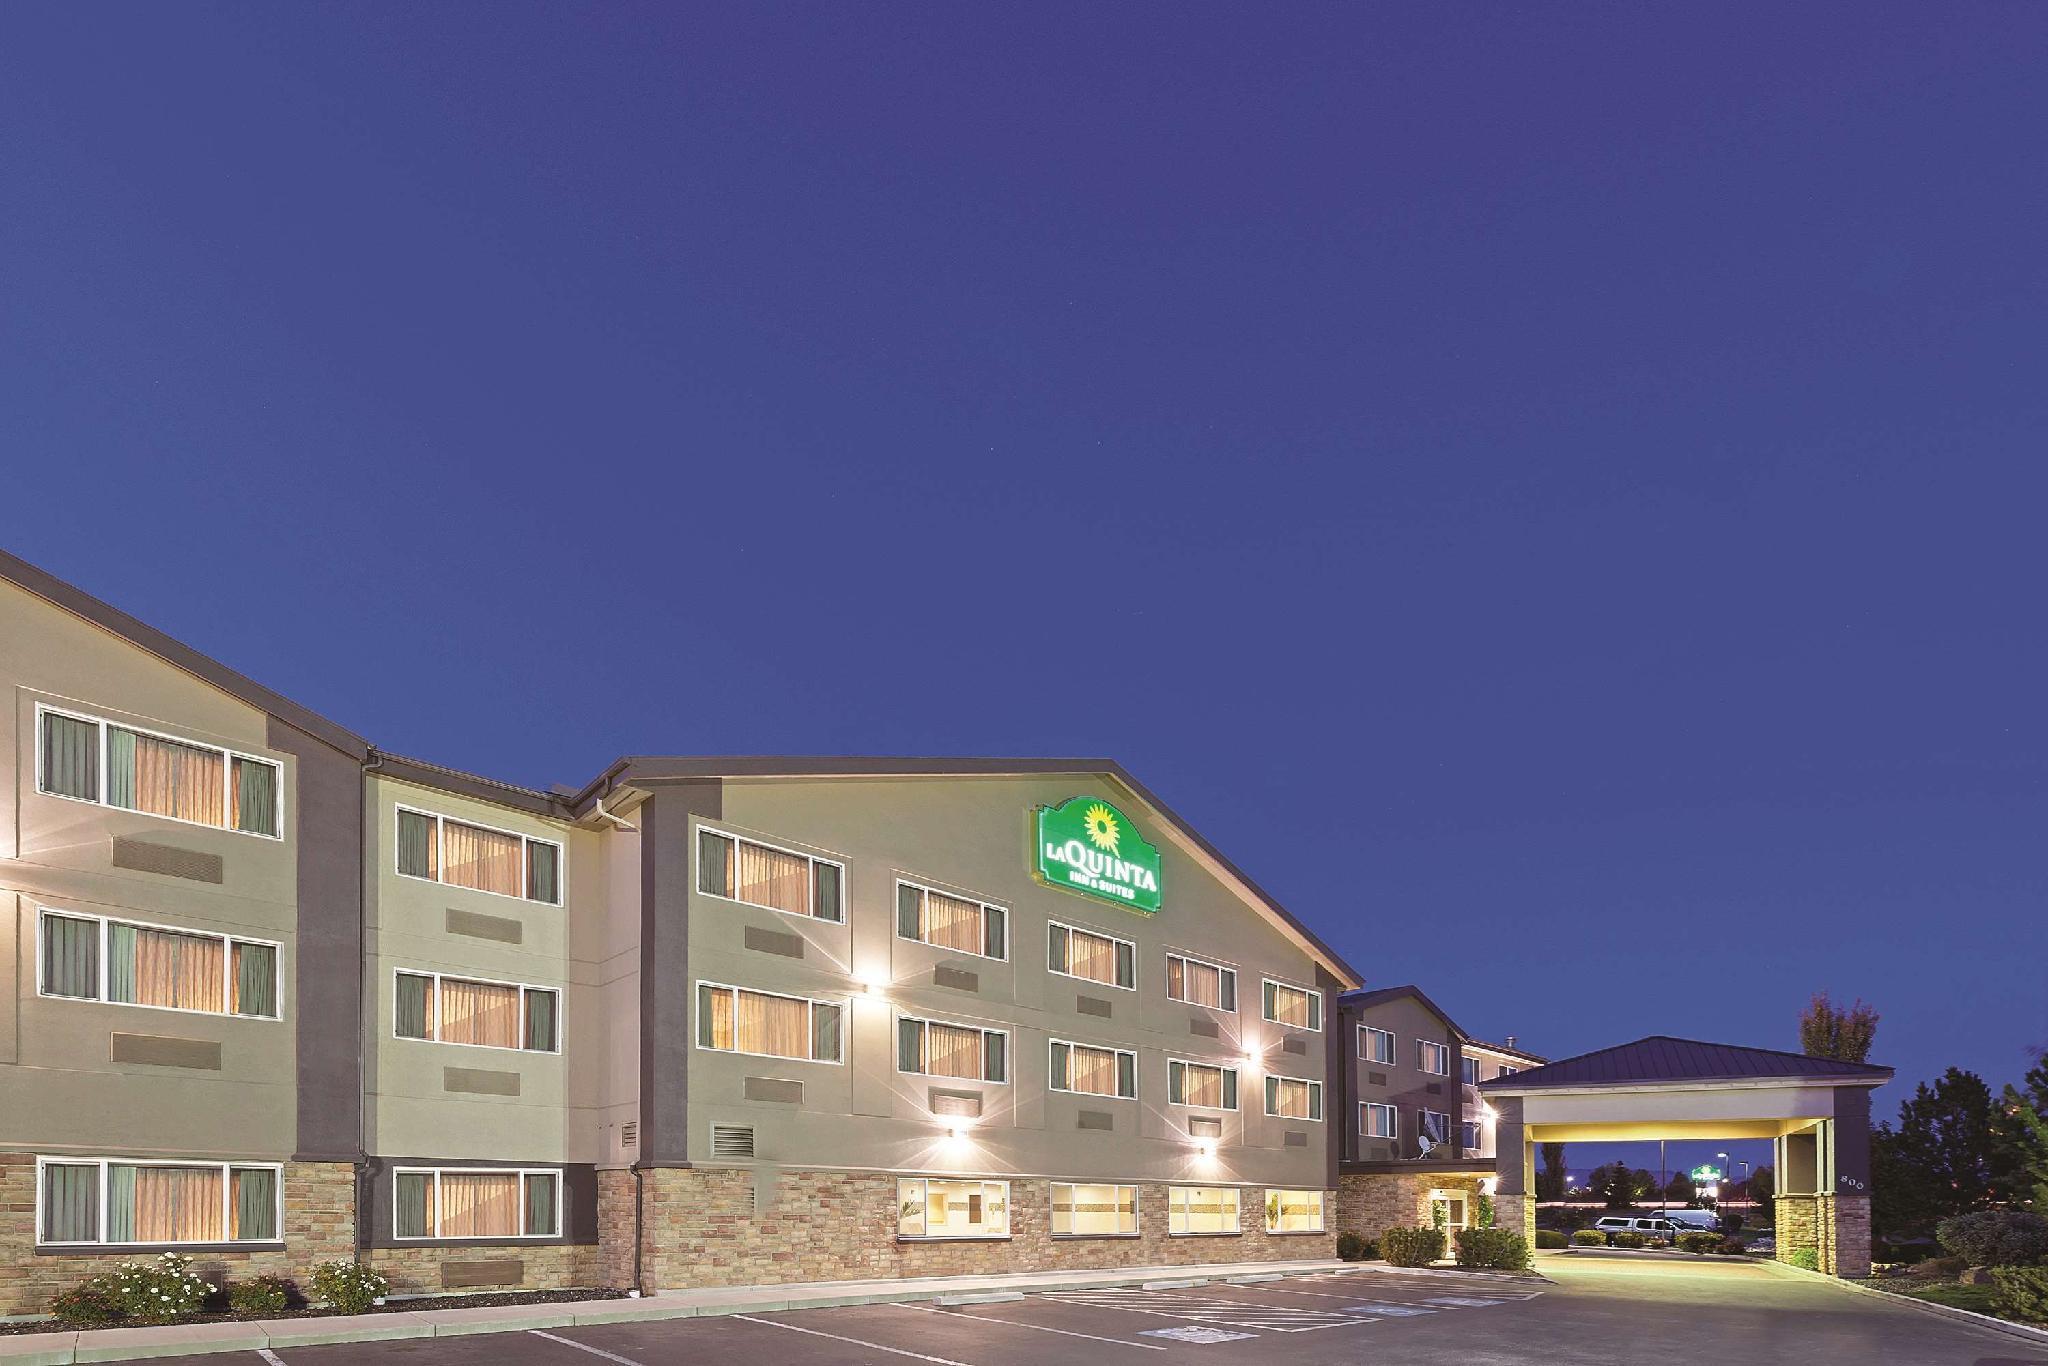 La Quinta Inn And Suites By Wyndham Meridian   Boise West